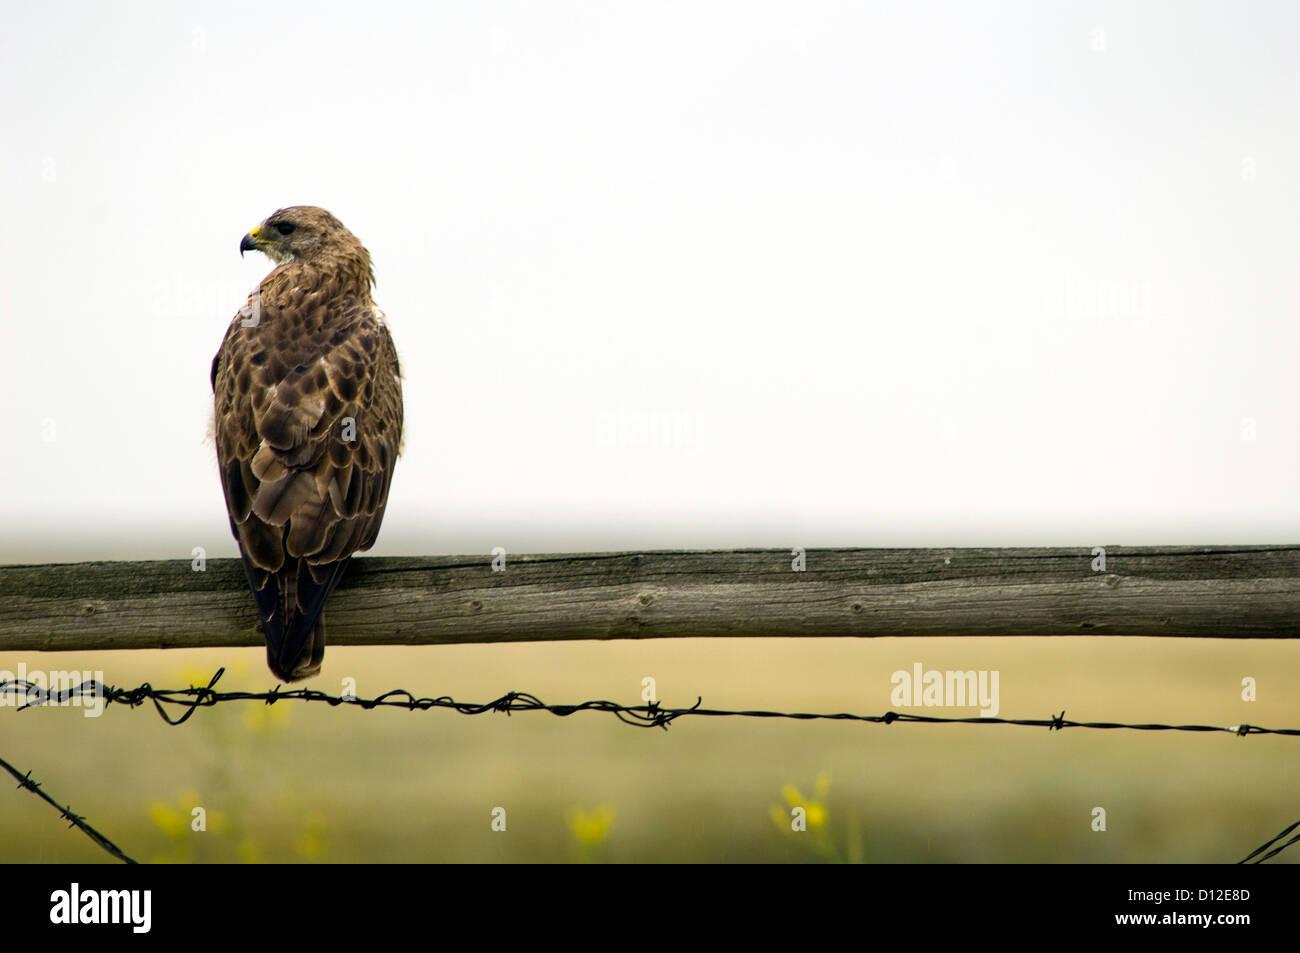 Hawk on fence pole. Saskatchewan, Canada. - Stock Image